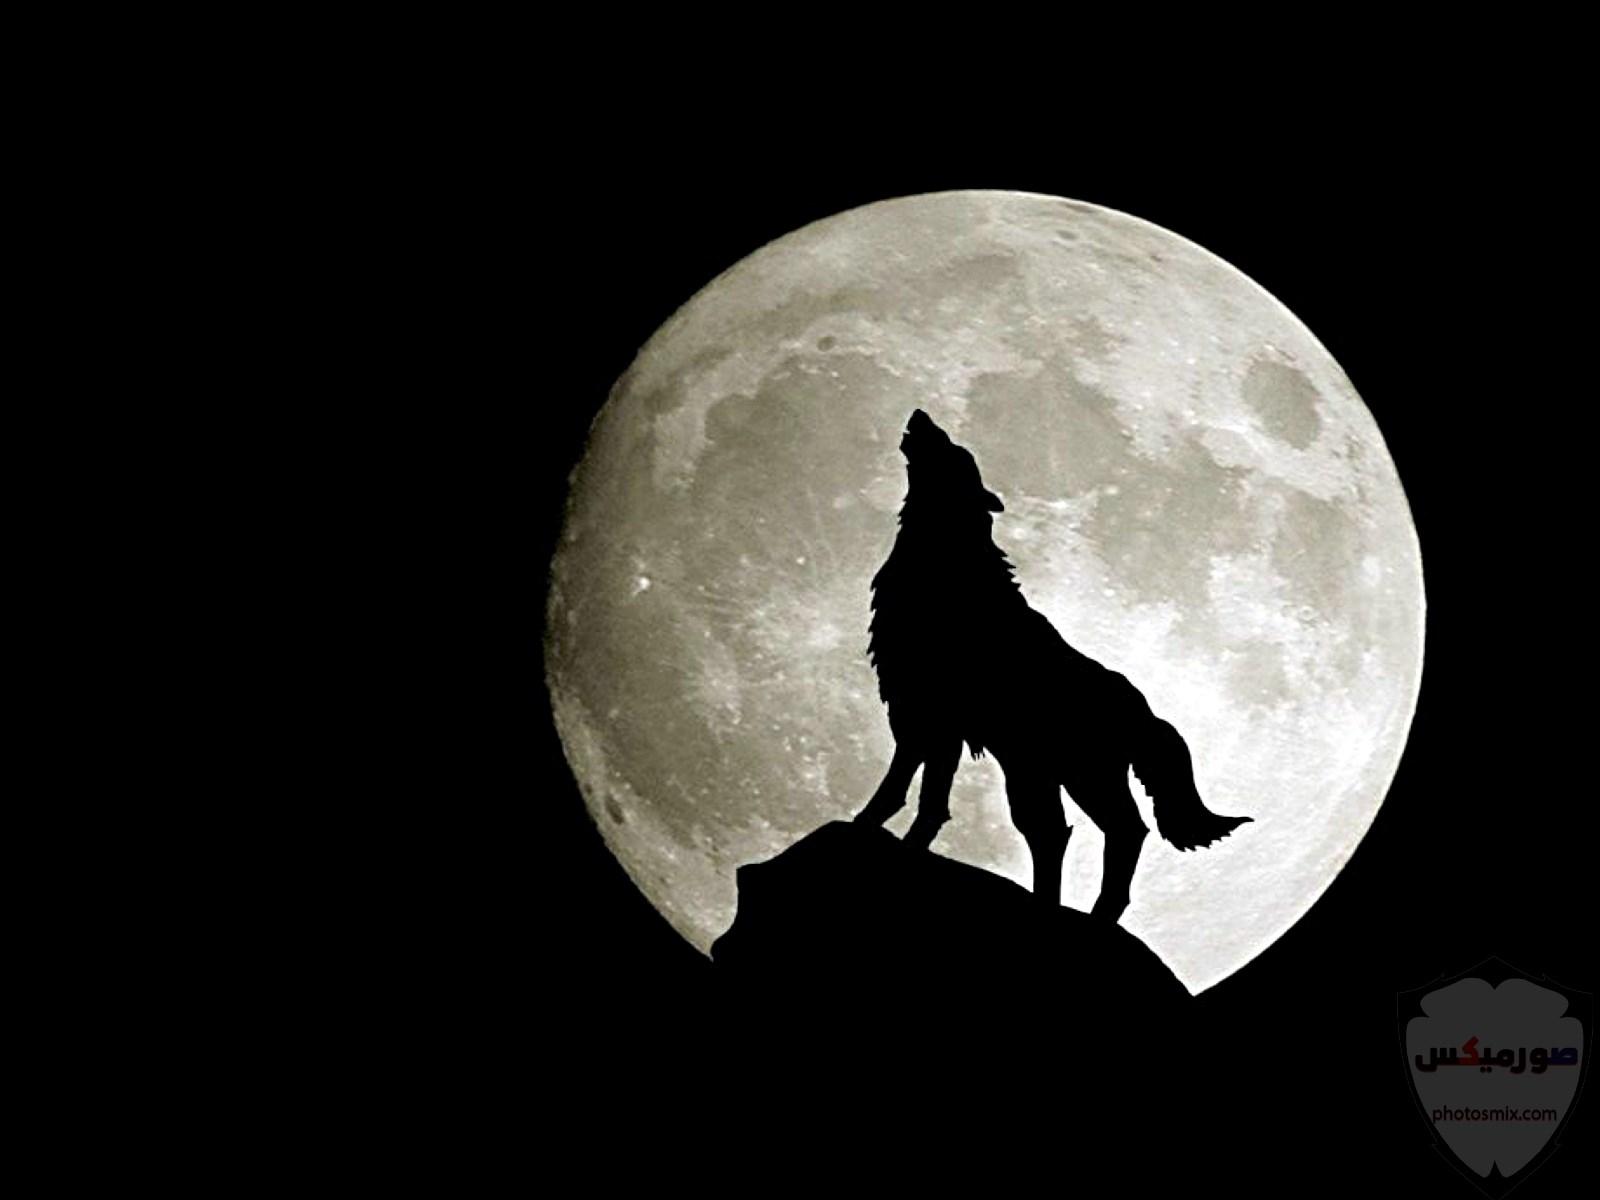 صور ذئاب صور ذئب مكتوب عليها كلام خلفيات ذئاب مرعبة خلفيات ذئاب جميلة صور خلفيات ذئاب خلفيات صور ذئاب حلوة صور ذئاب للواتس اب 9